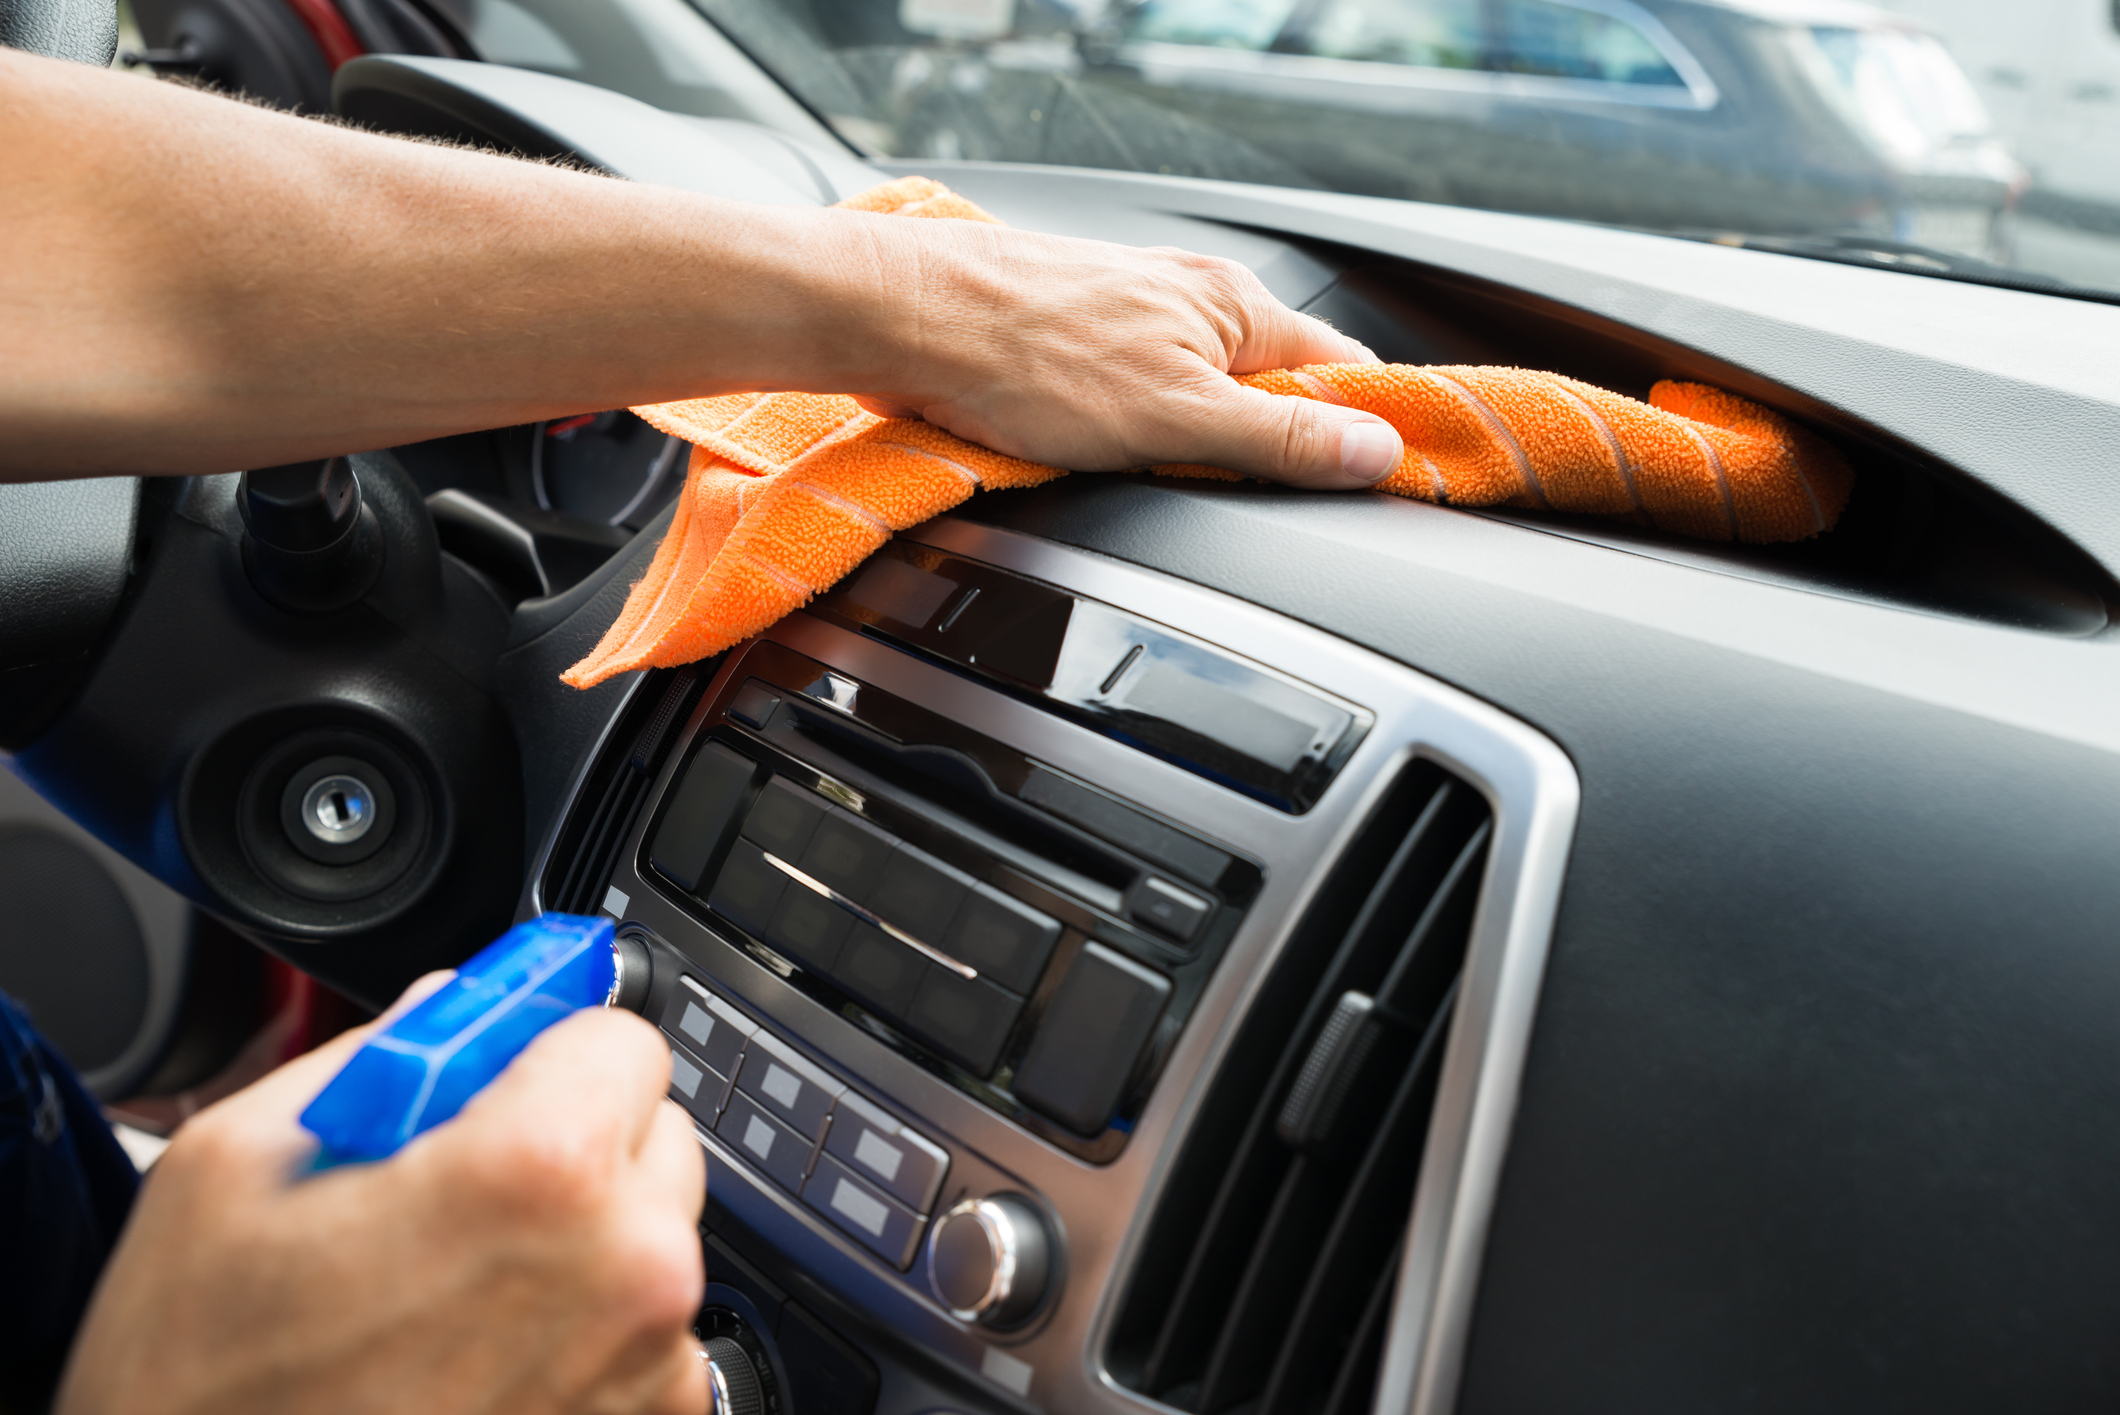 Full Size of Male Worker Cleaning Car Dashboard Küche Gerüche Neutralisieren Auto